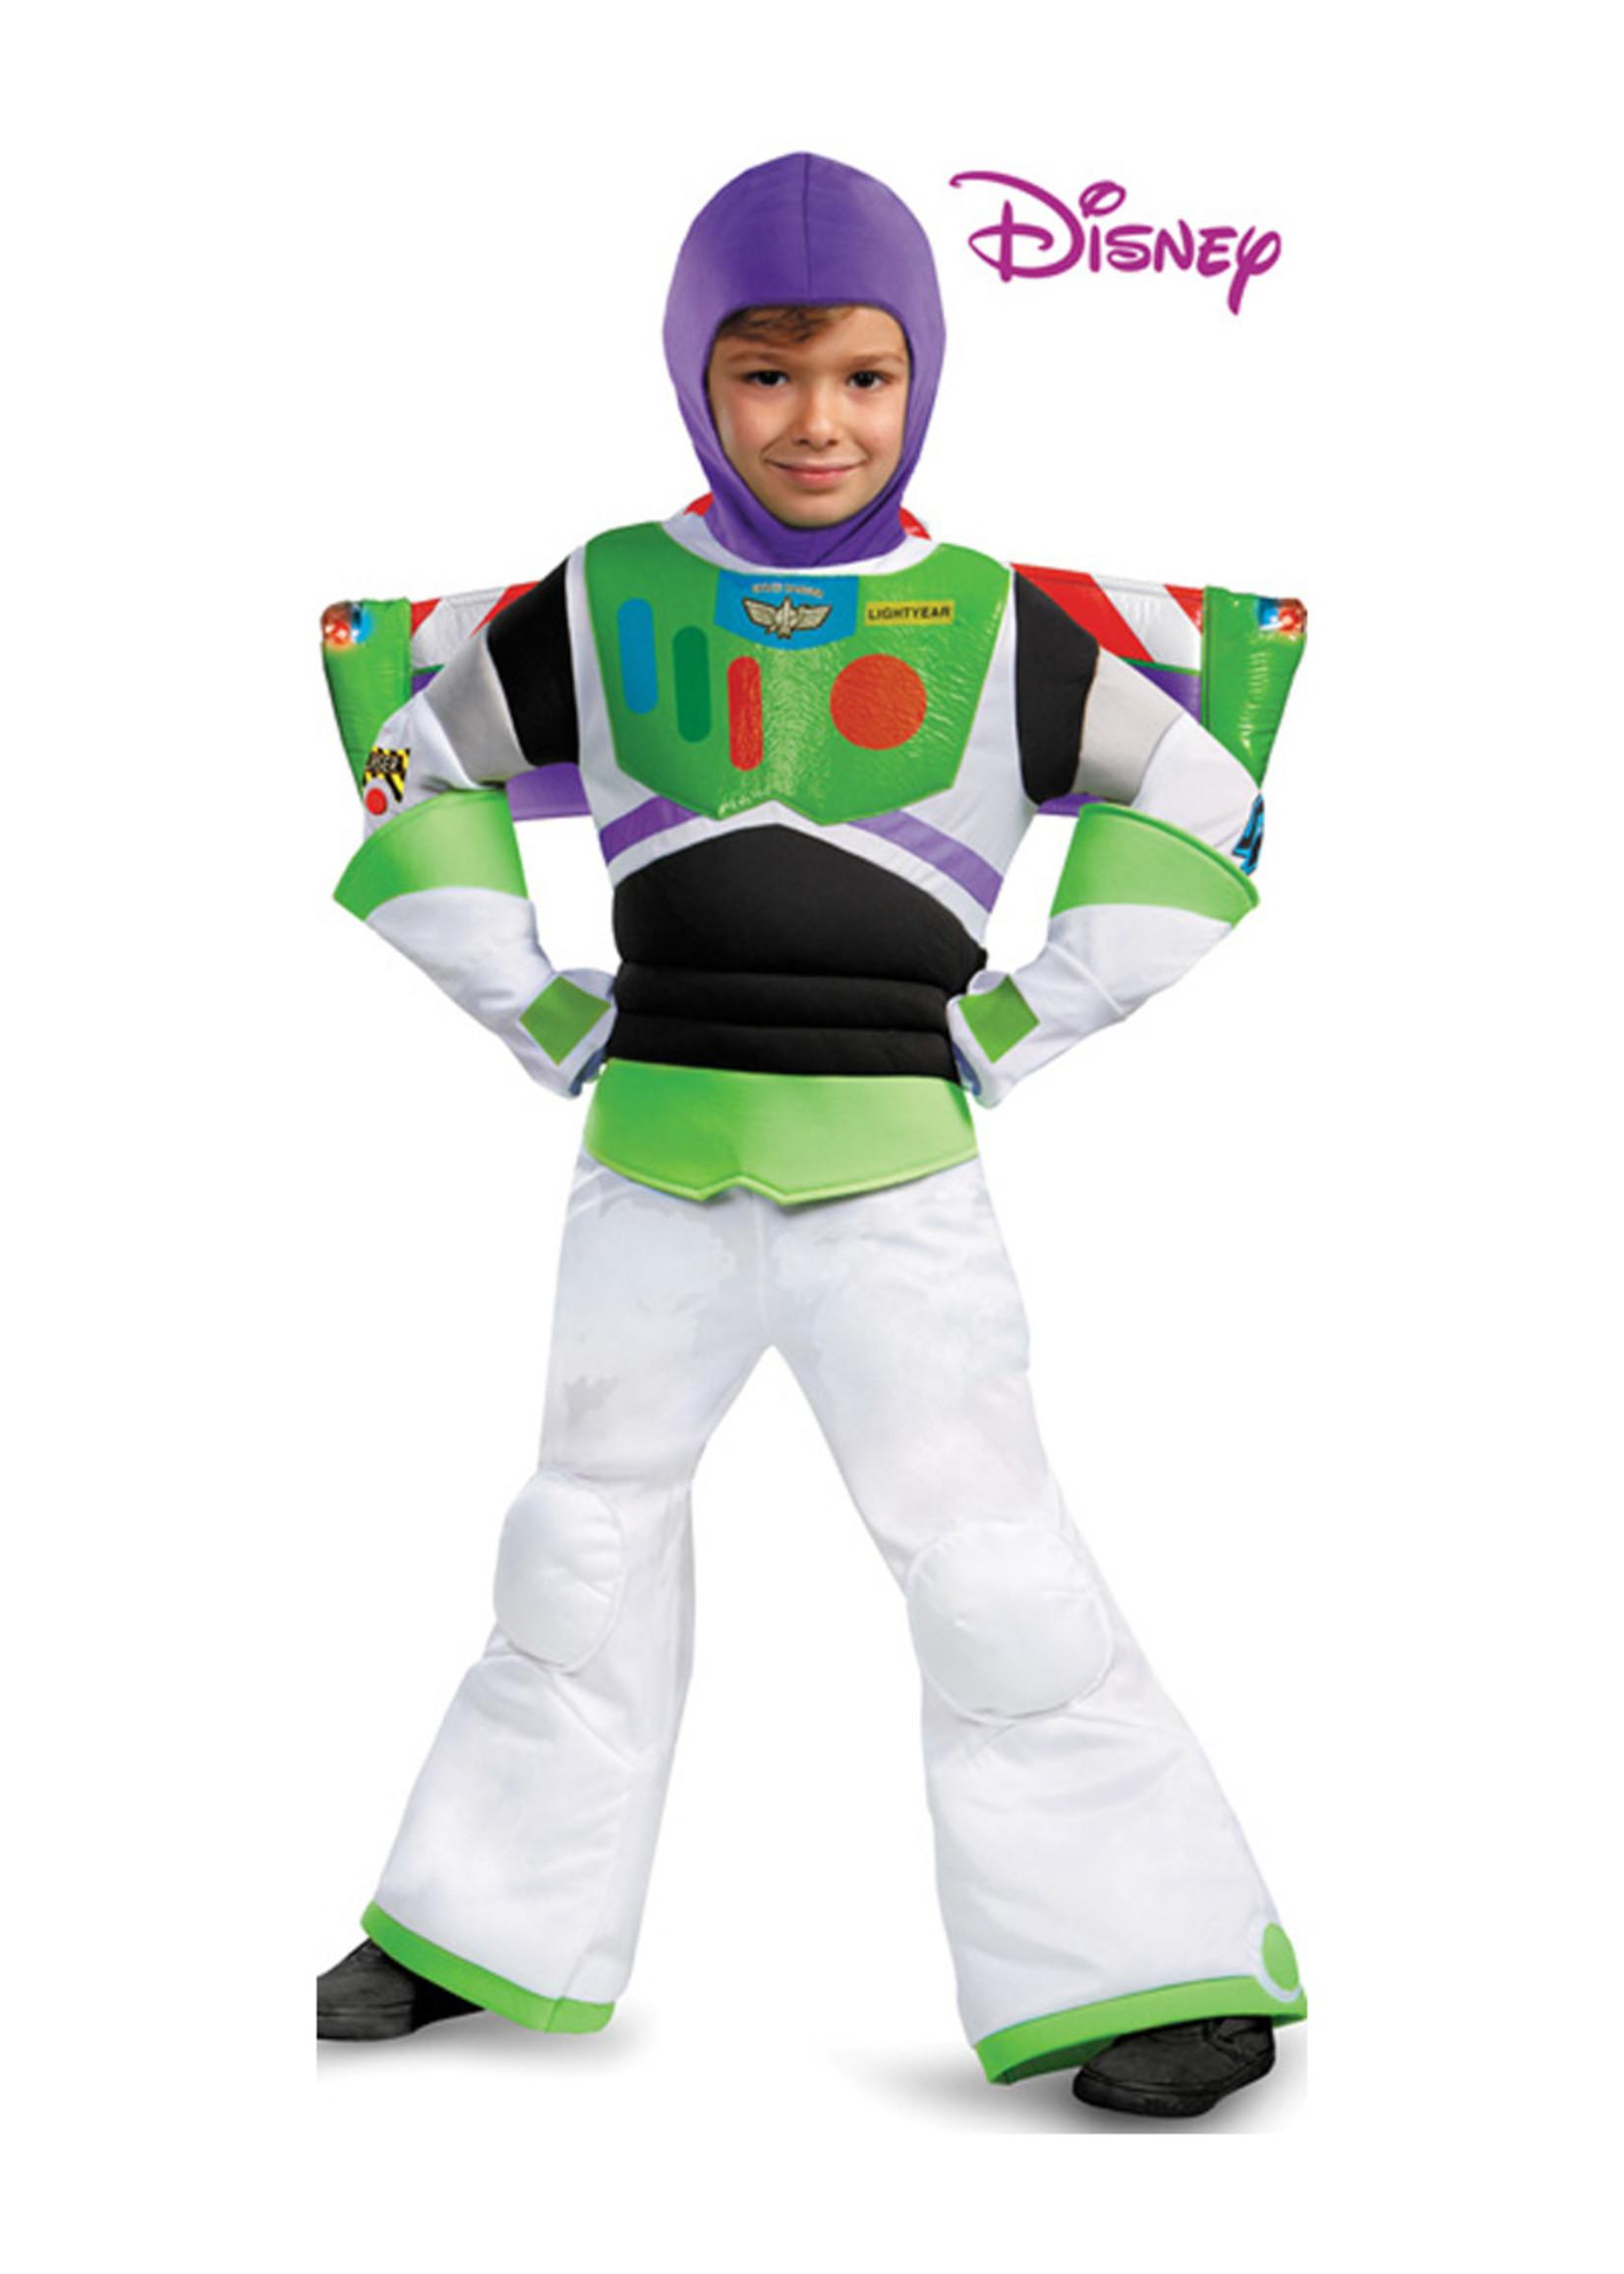 Buzz Lightyear Deluxe Costume - Boys